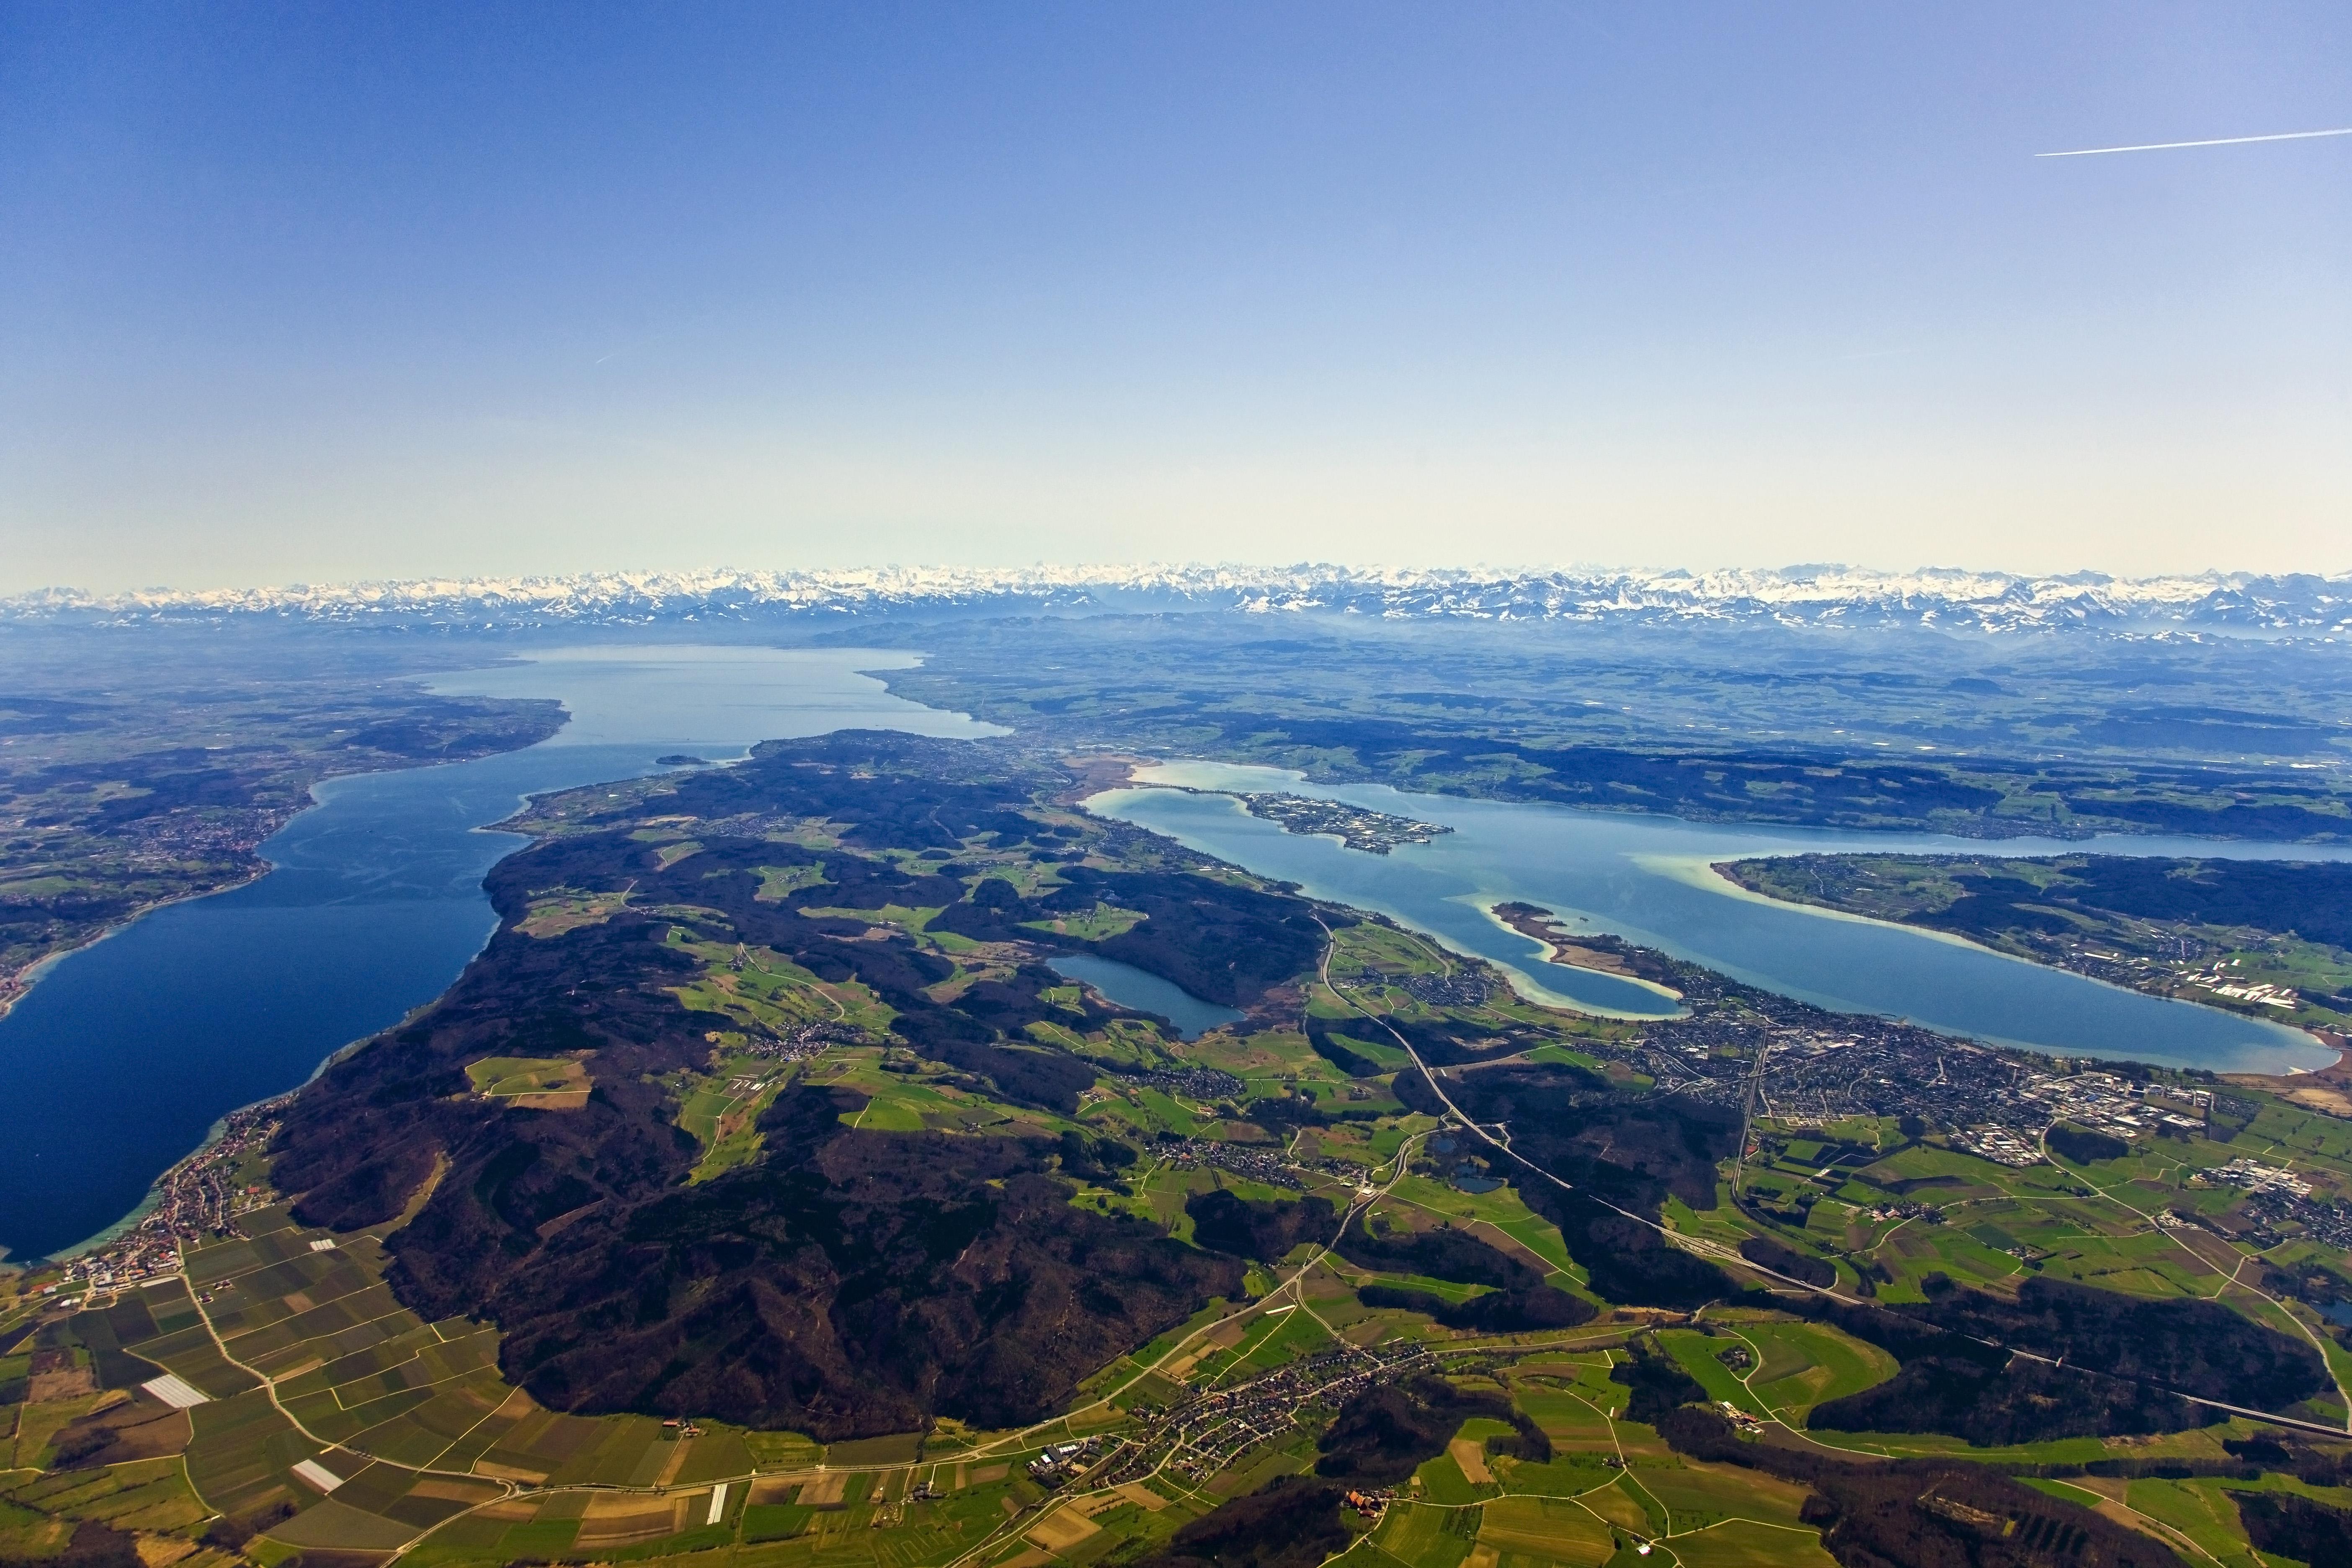 IBT_Bodensee_mit_Alpenpanorama_Mende_9513